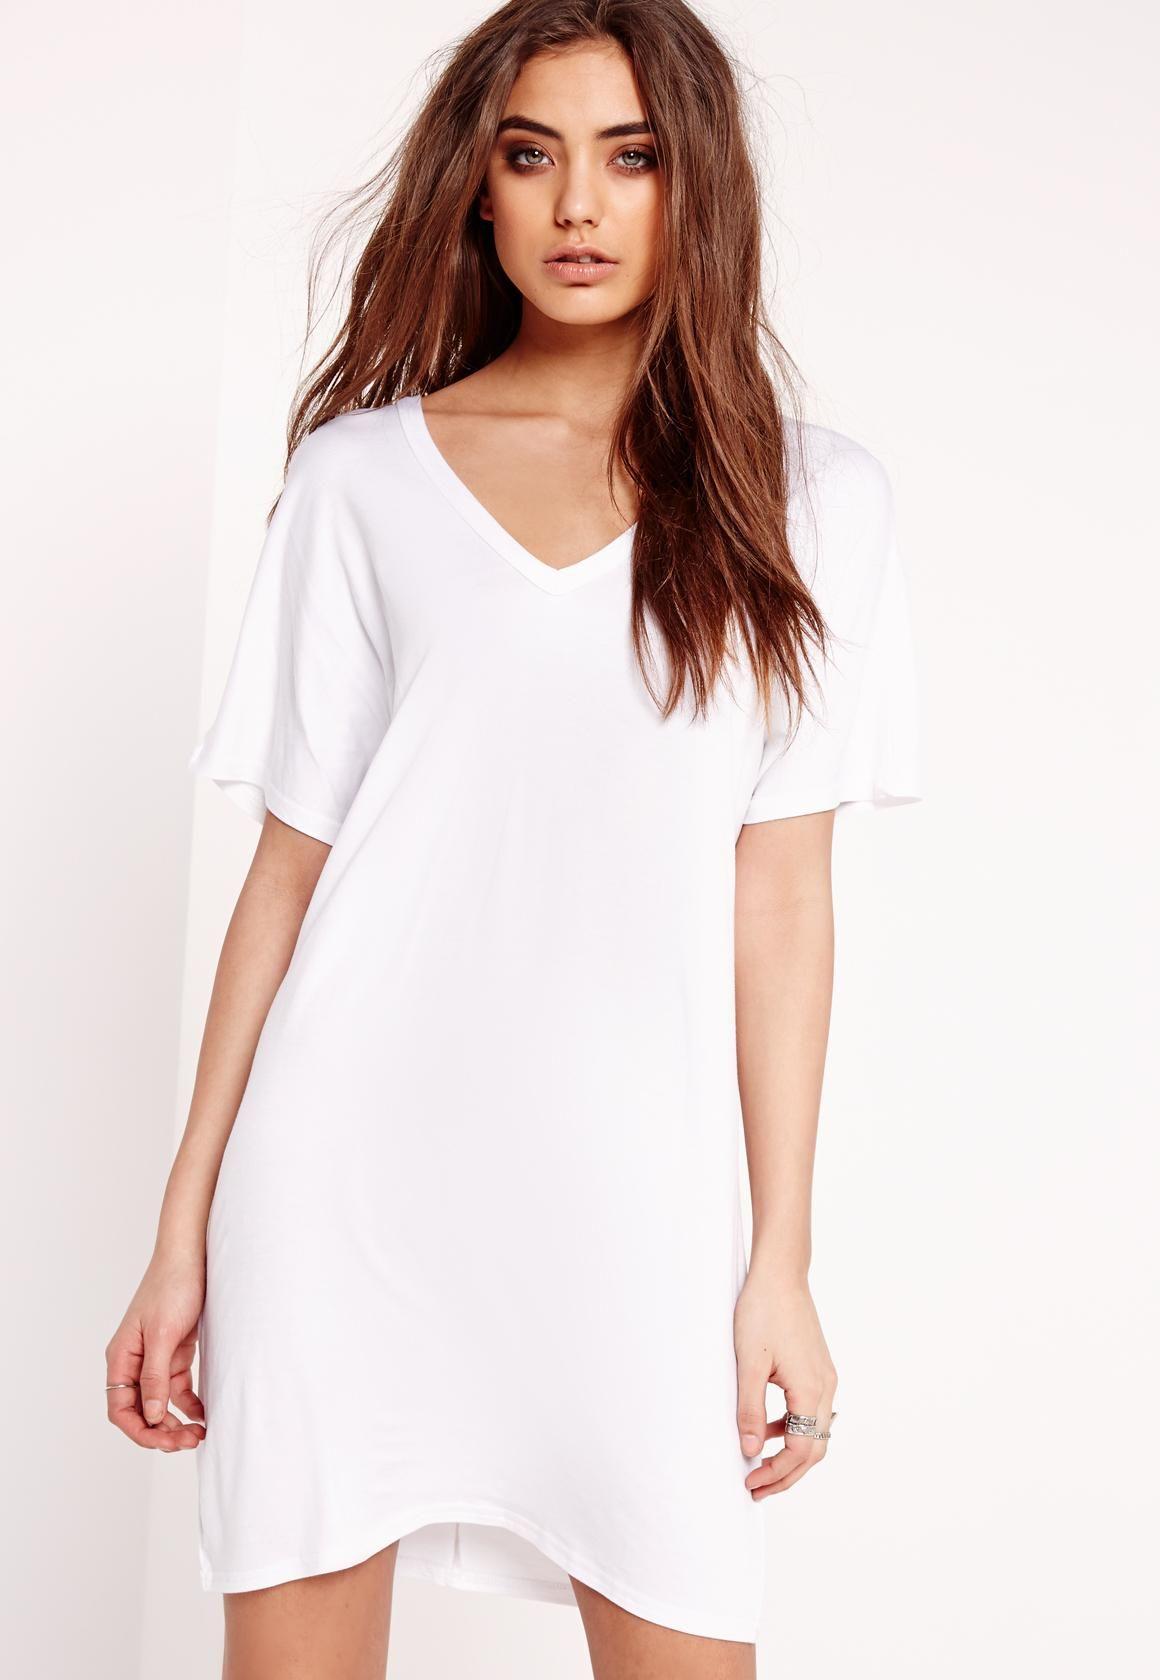 Wide V Neck T Shirt Dress White Impressmode Com White Dresses Uk White Shirt Dress Dress Blog